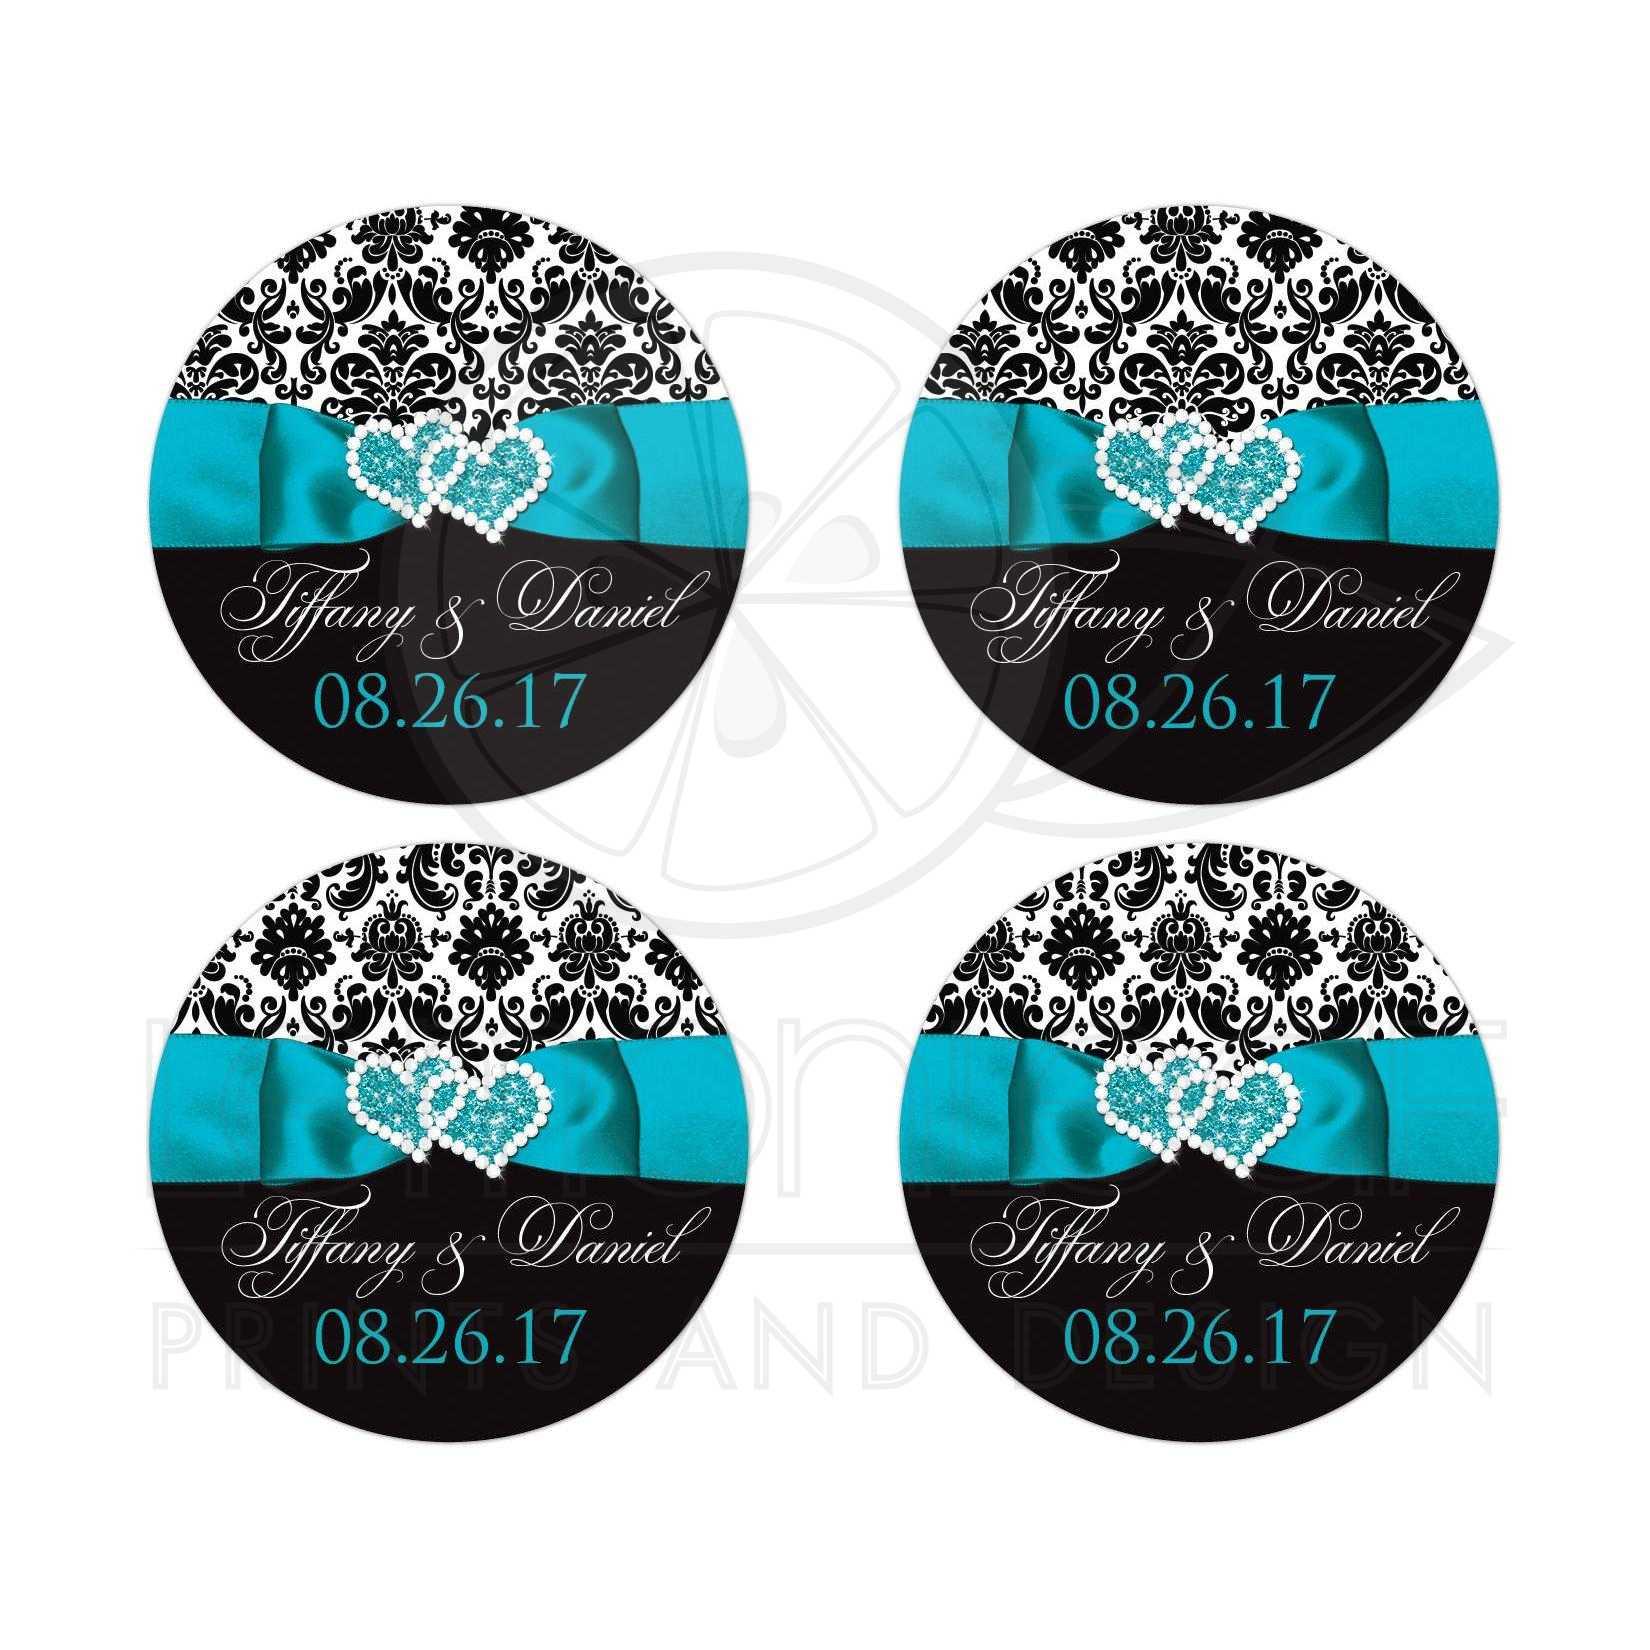 Personalized Wedding Favor Sticker - 2\